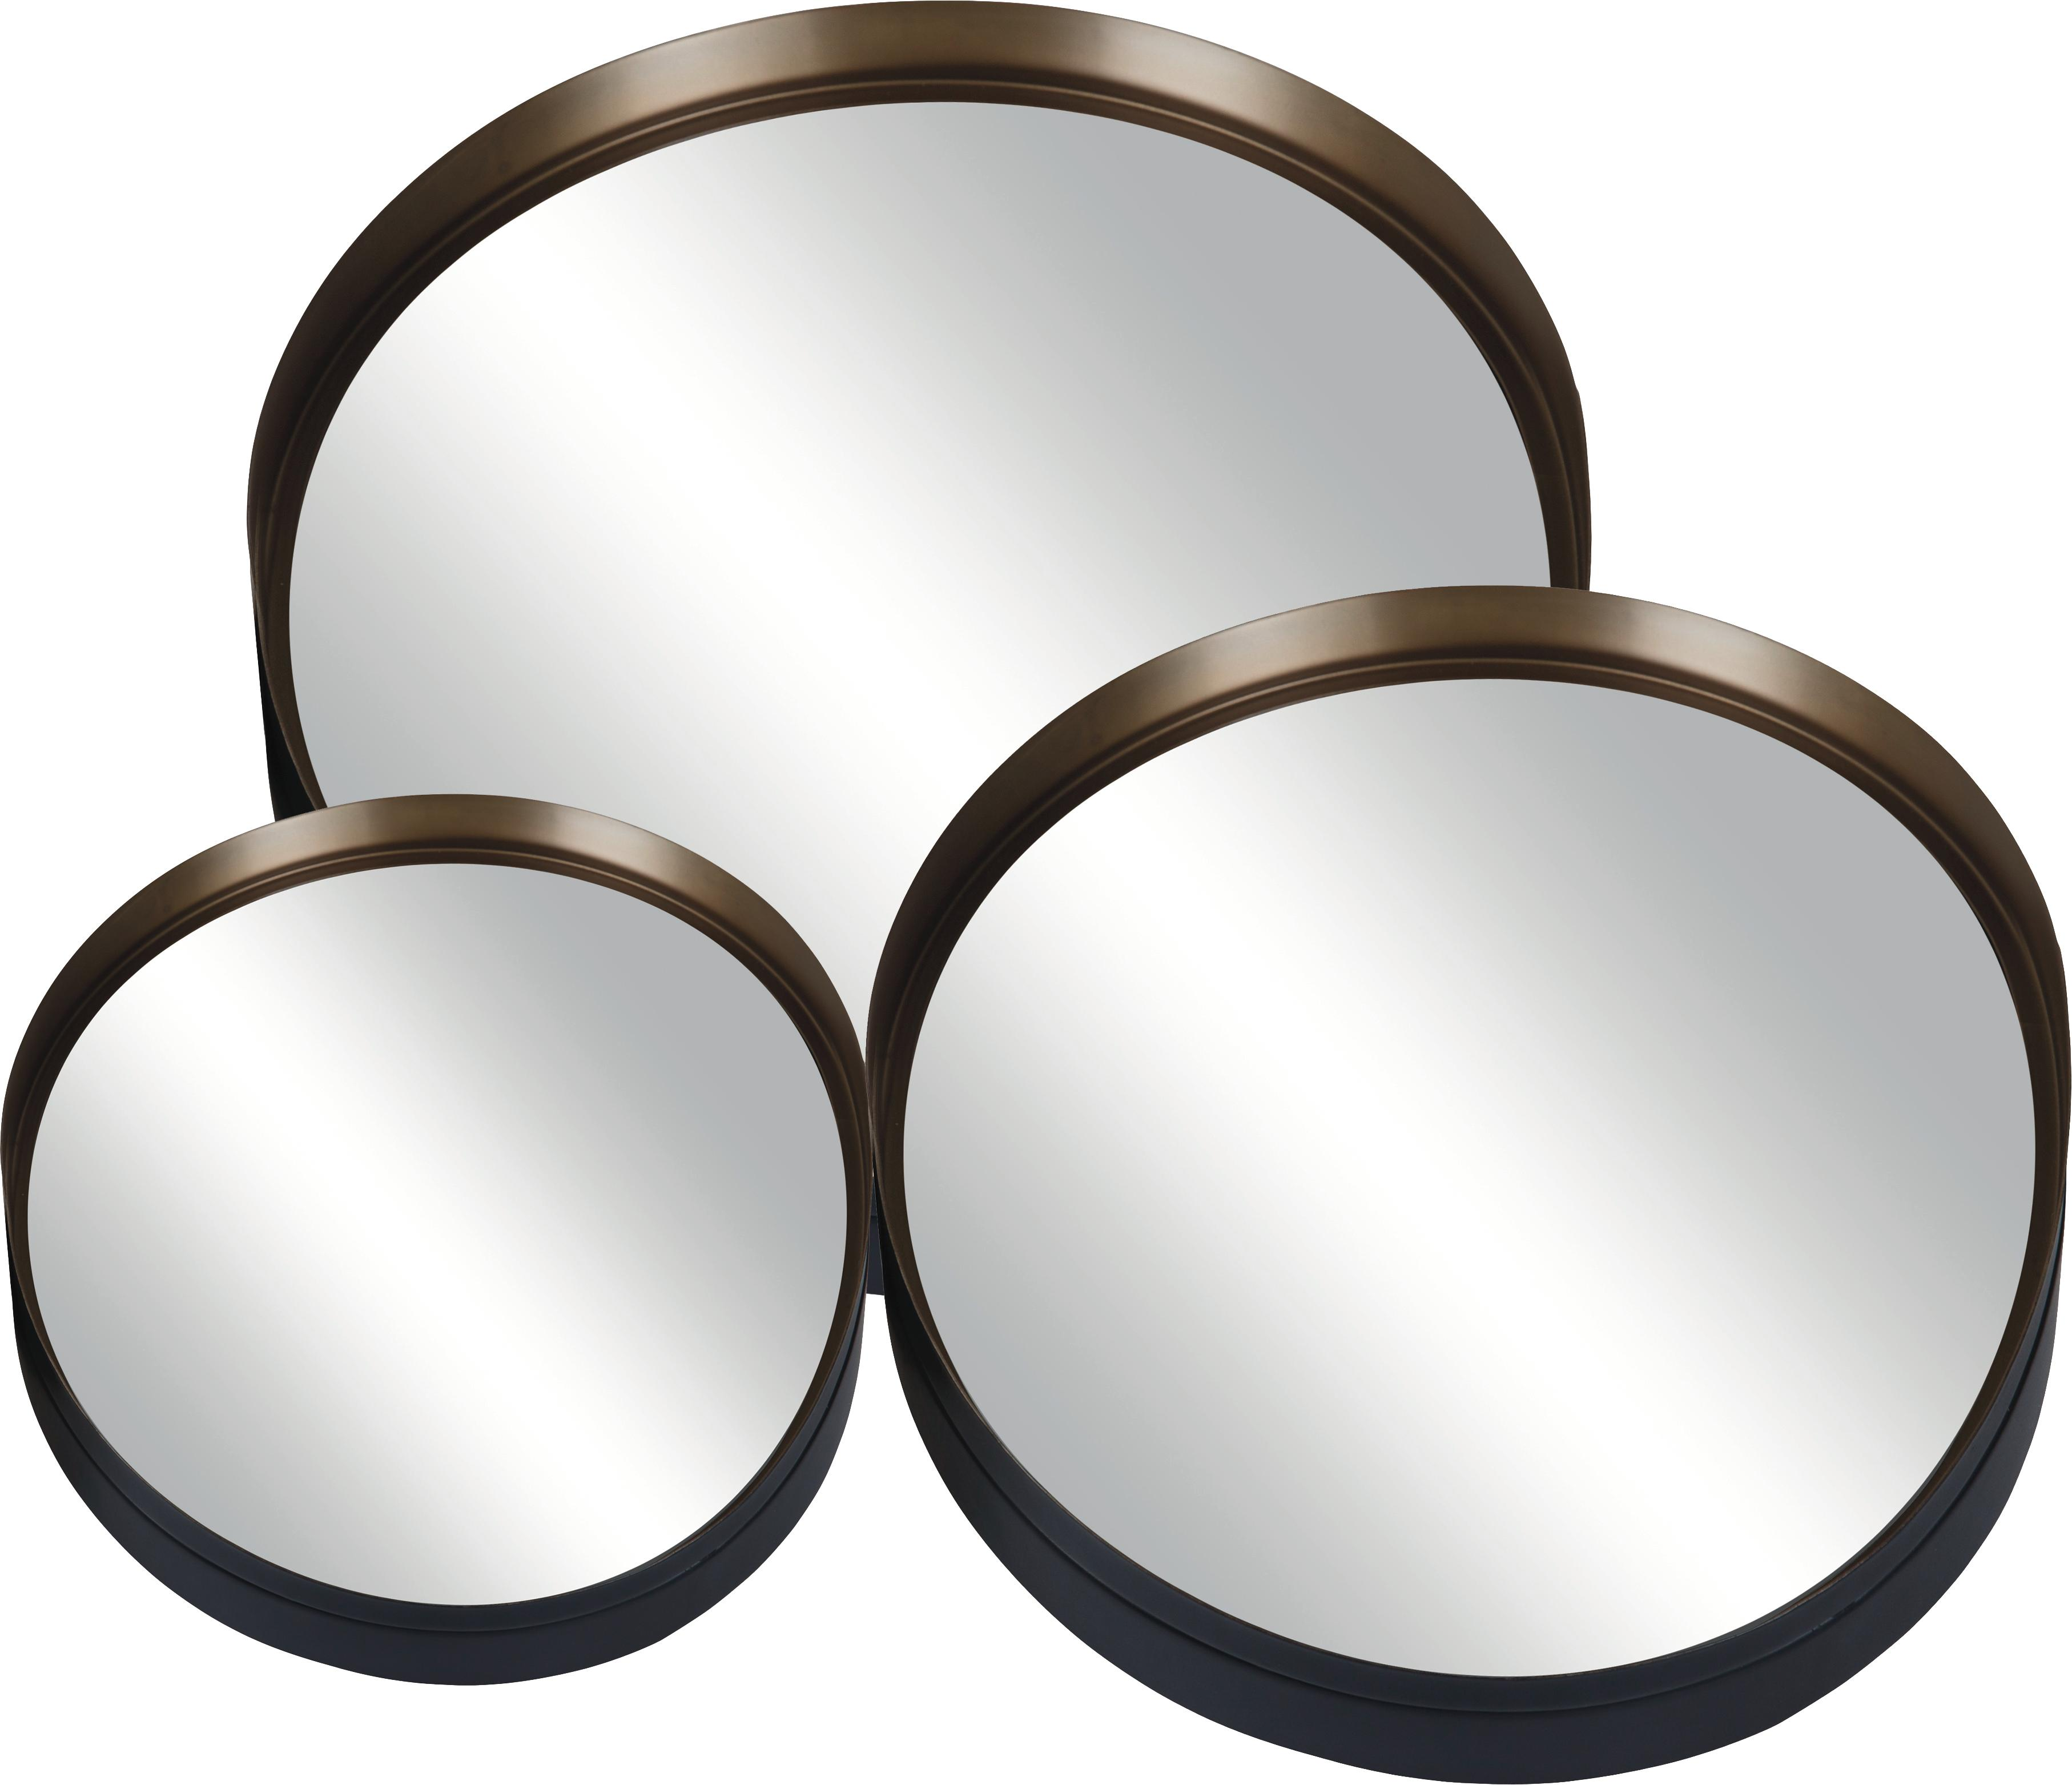 Set de espejos de pared redondos Dolce, 3pzas., Espejo: cristal, Reverso: tablero de fibras de dens, Negro, oro, Set de diferentes tamaños